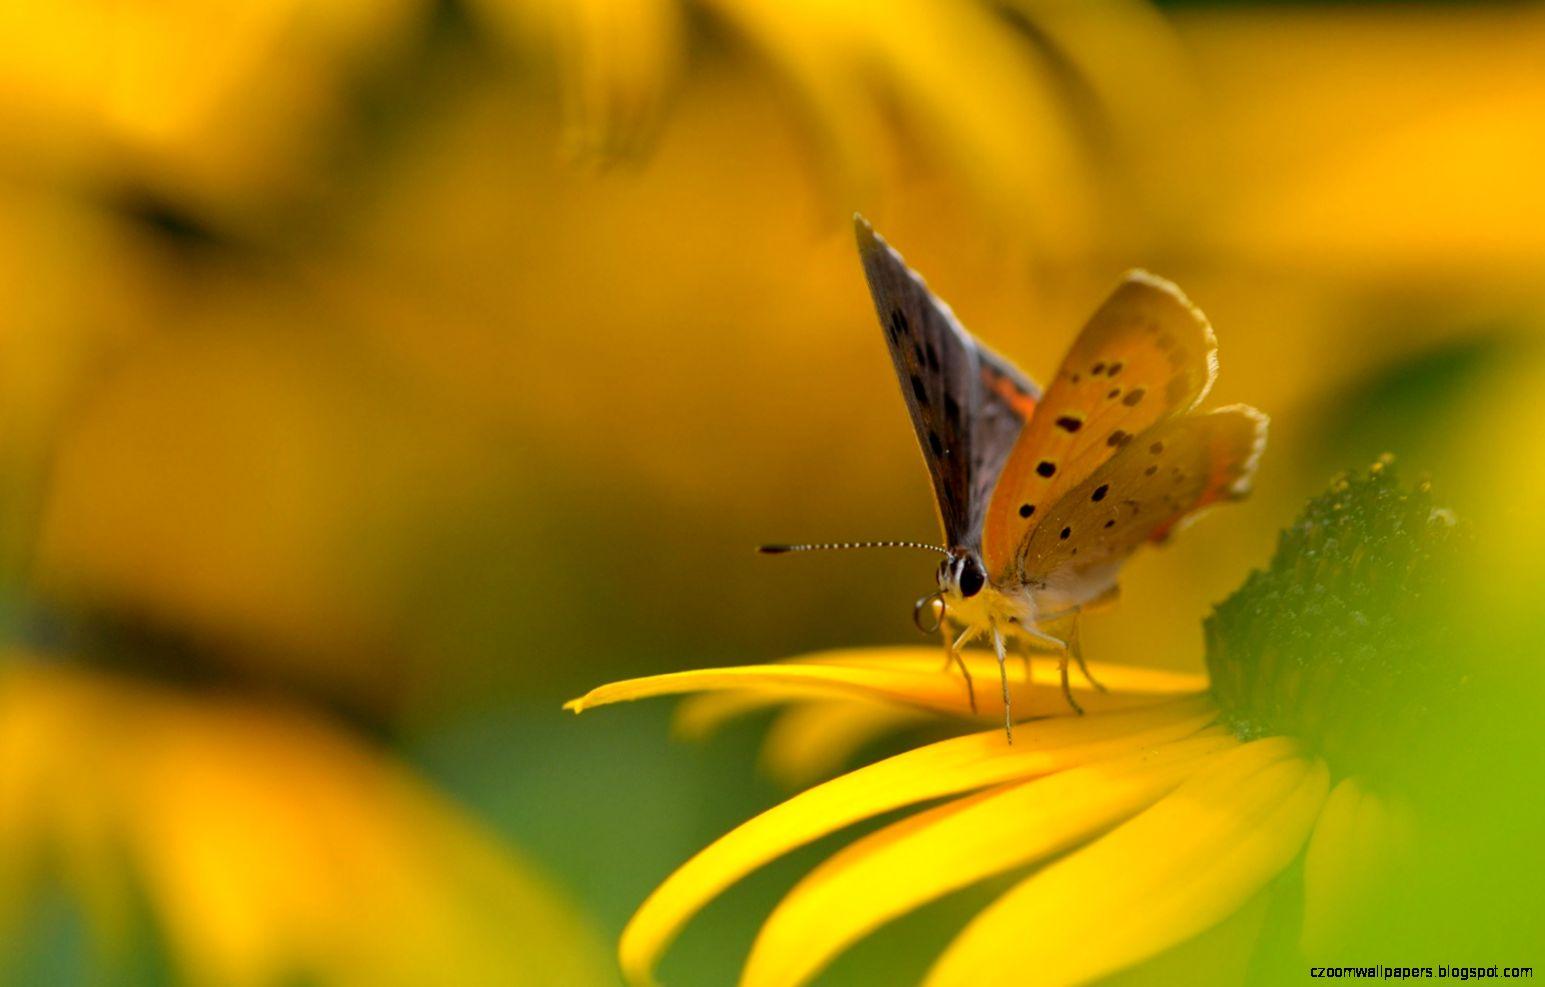 flower yellow butterfly wallpaper 1680x1050 1